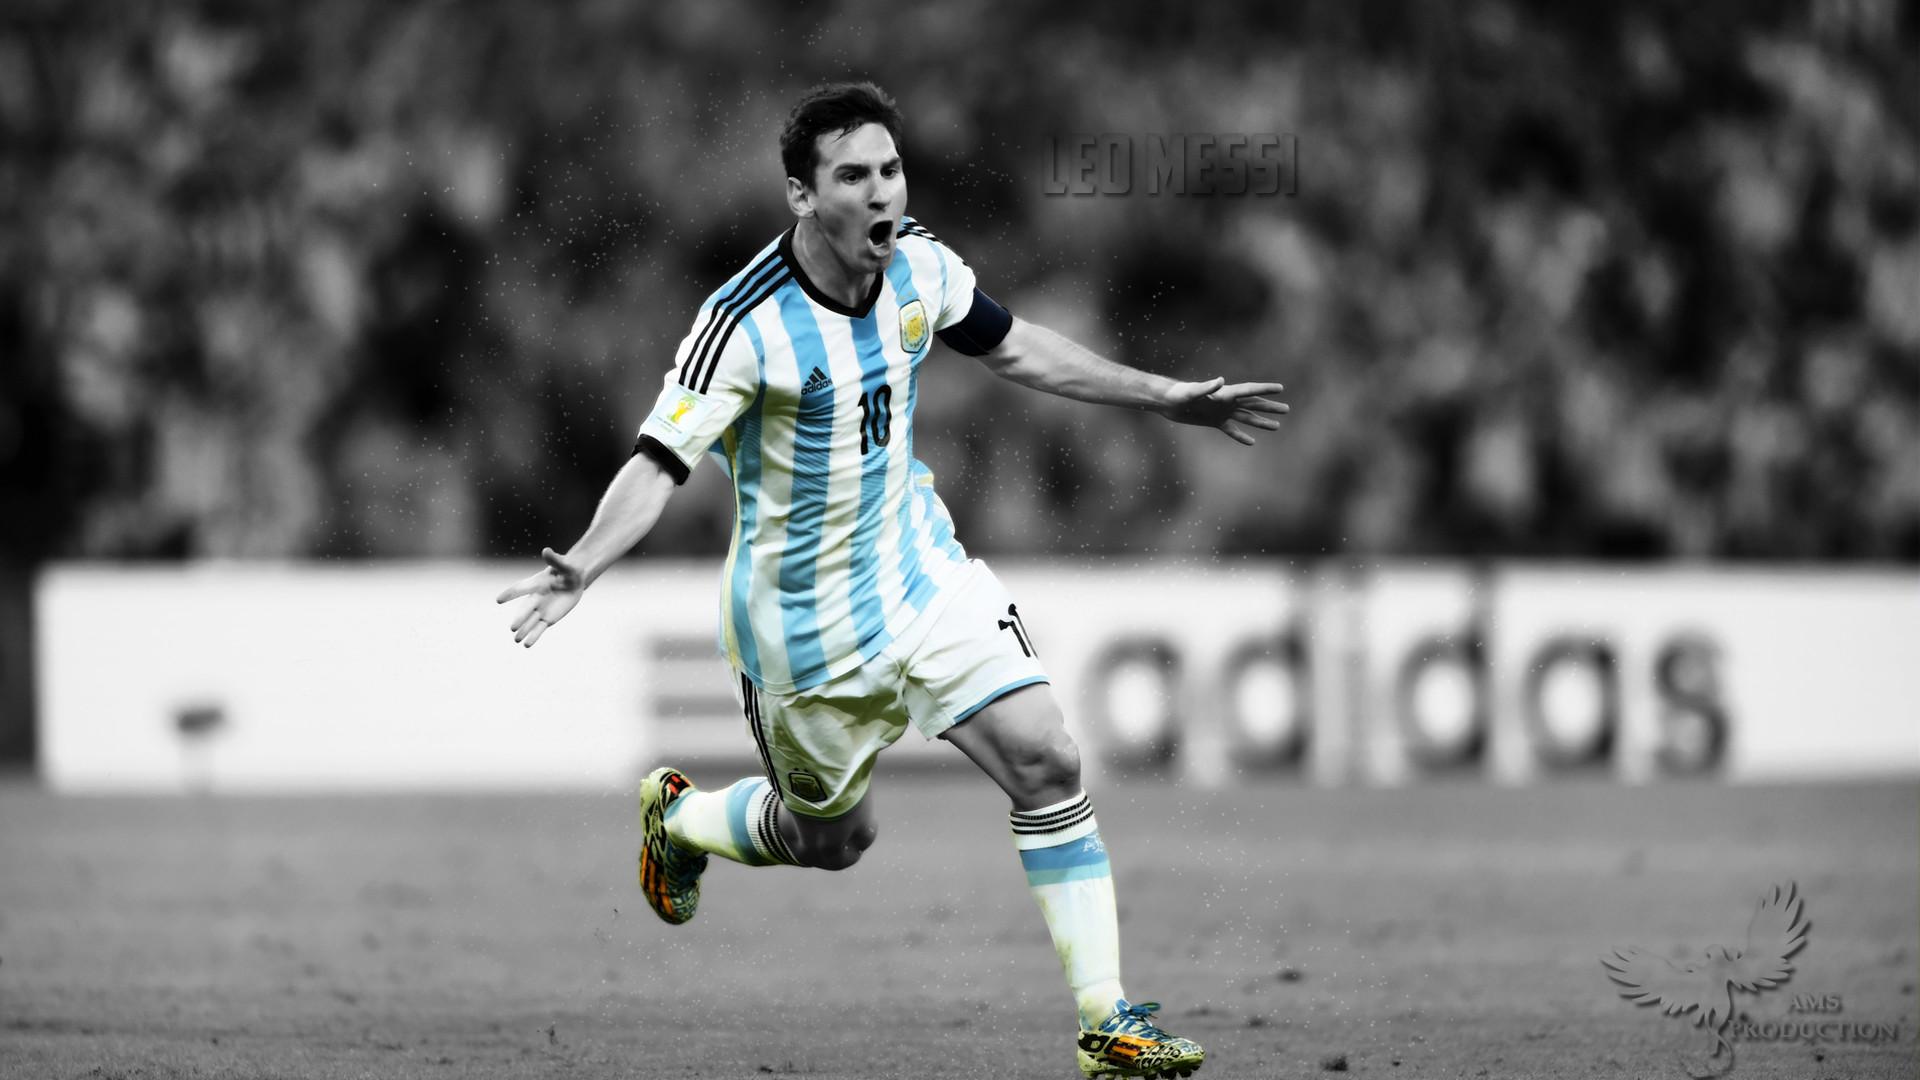 Wallpaper Lionel Messi 2018 79 Images